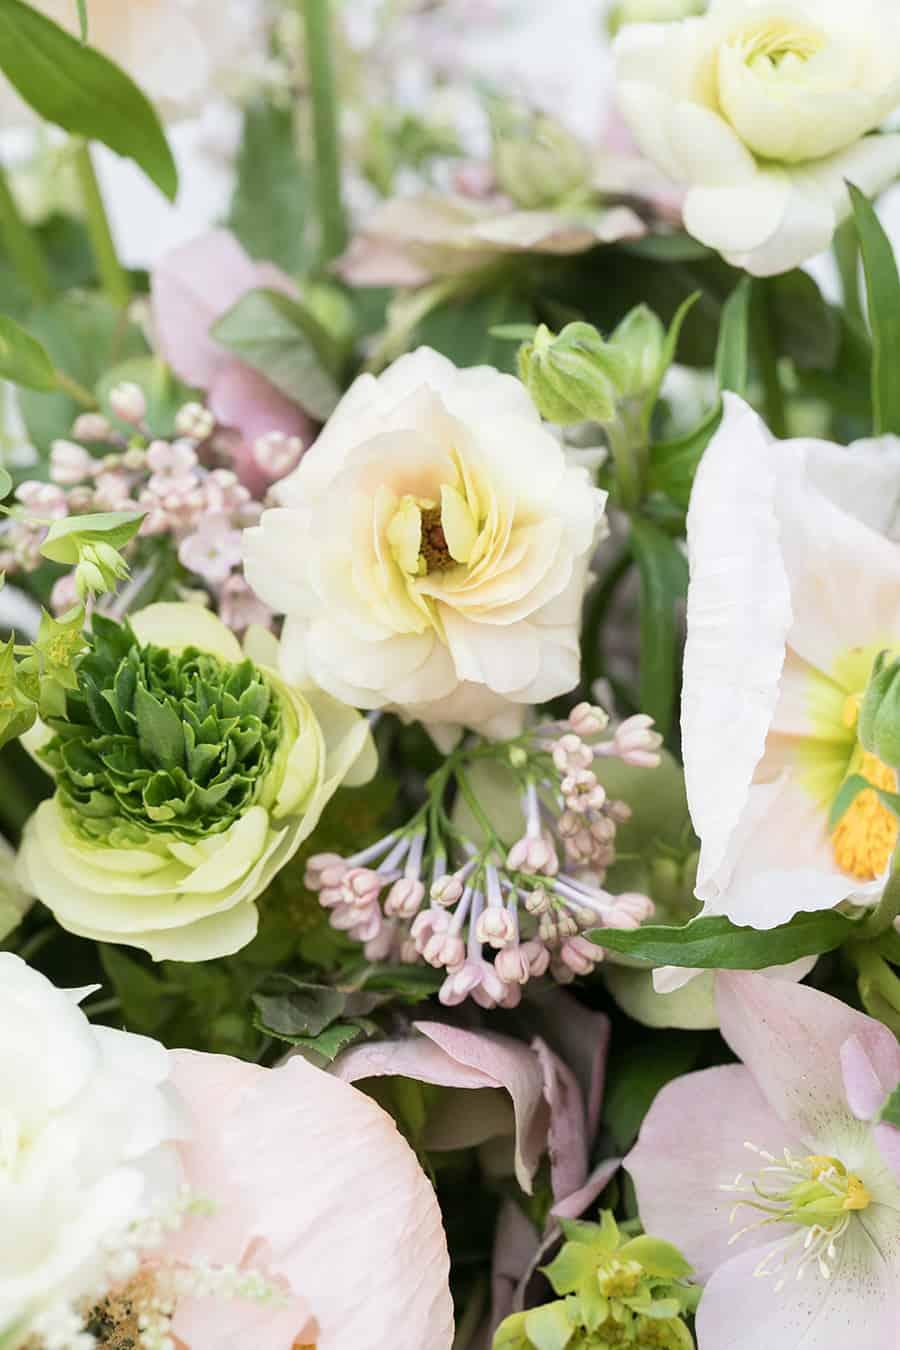 Close up photos of flowers.